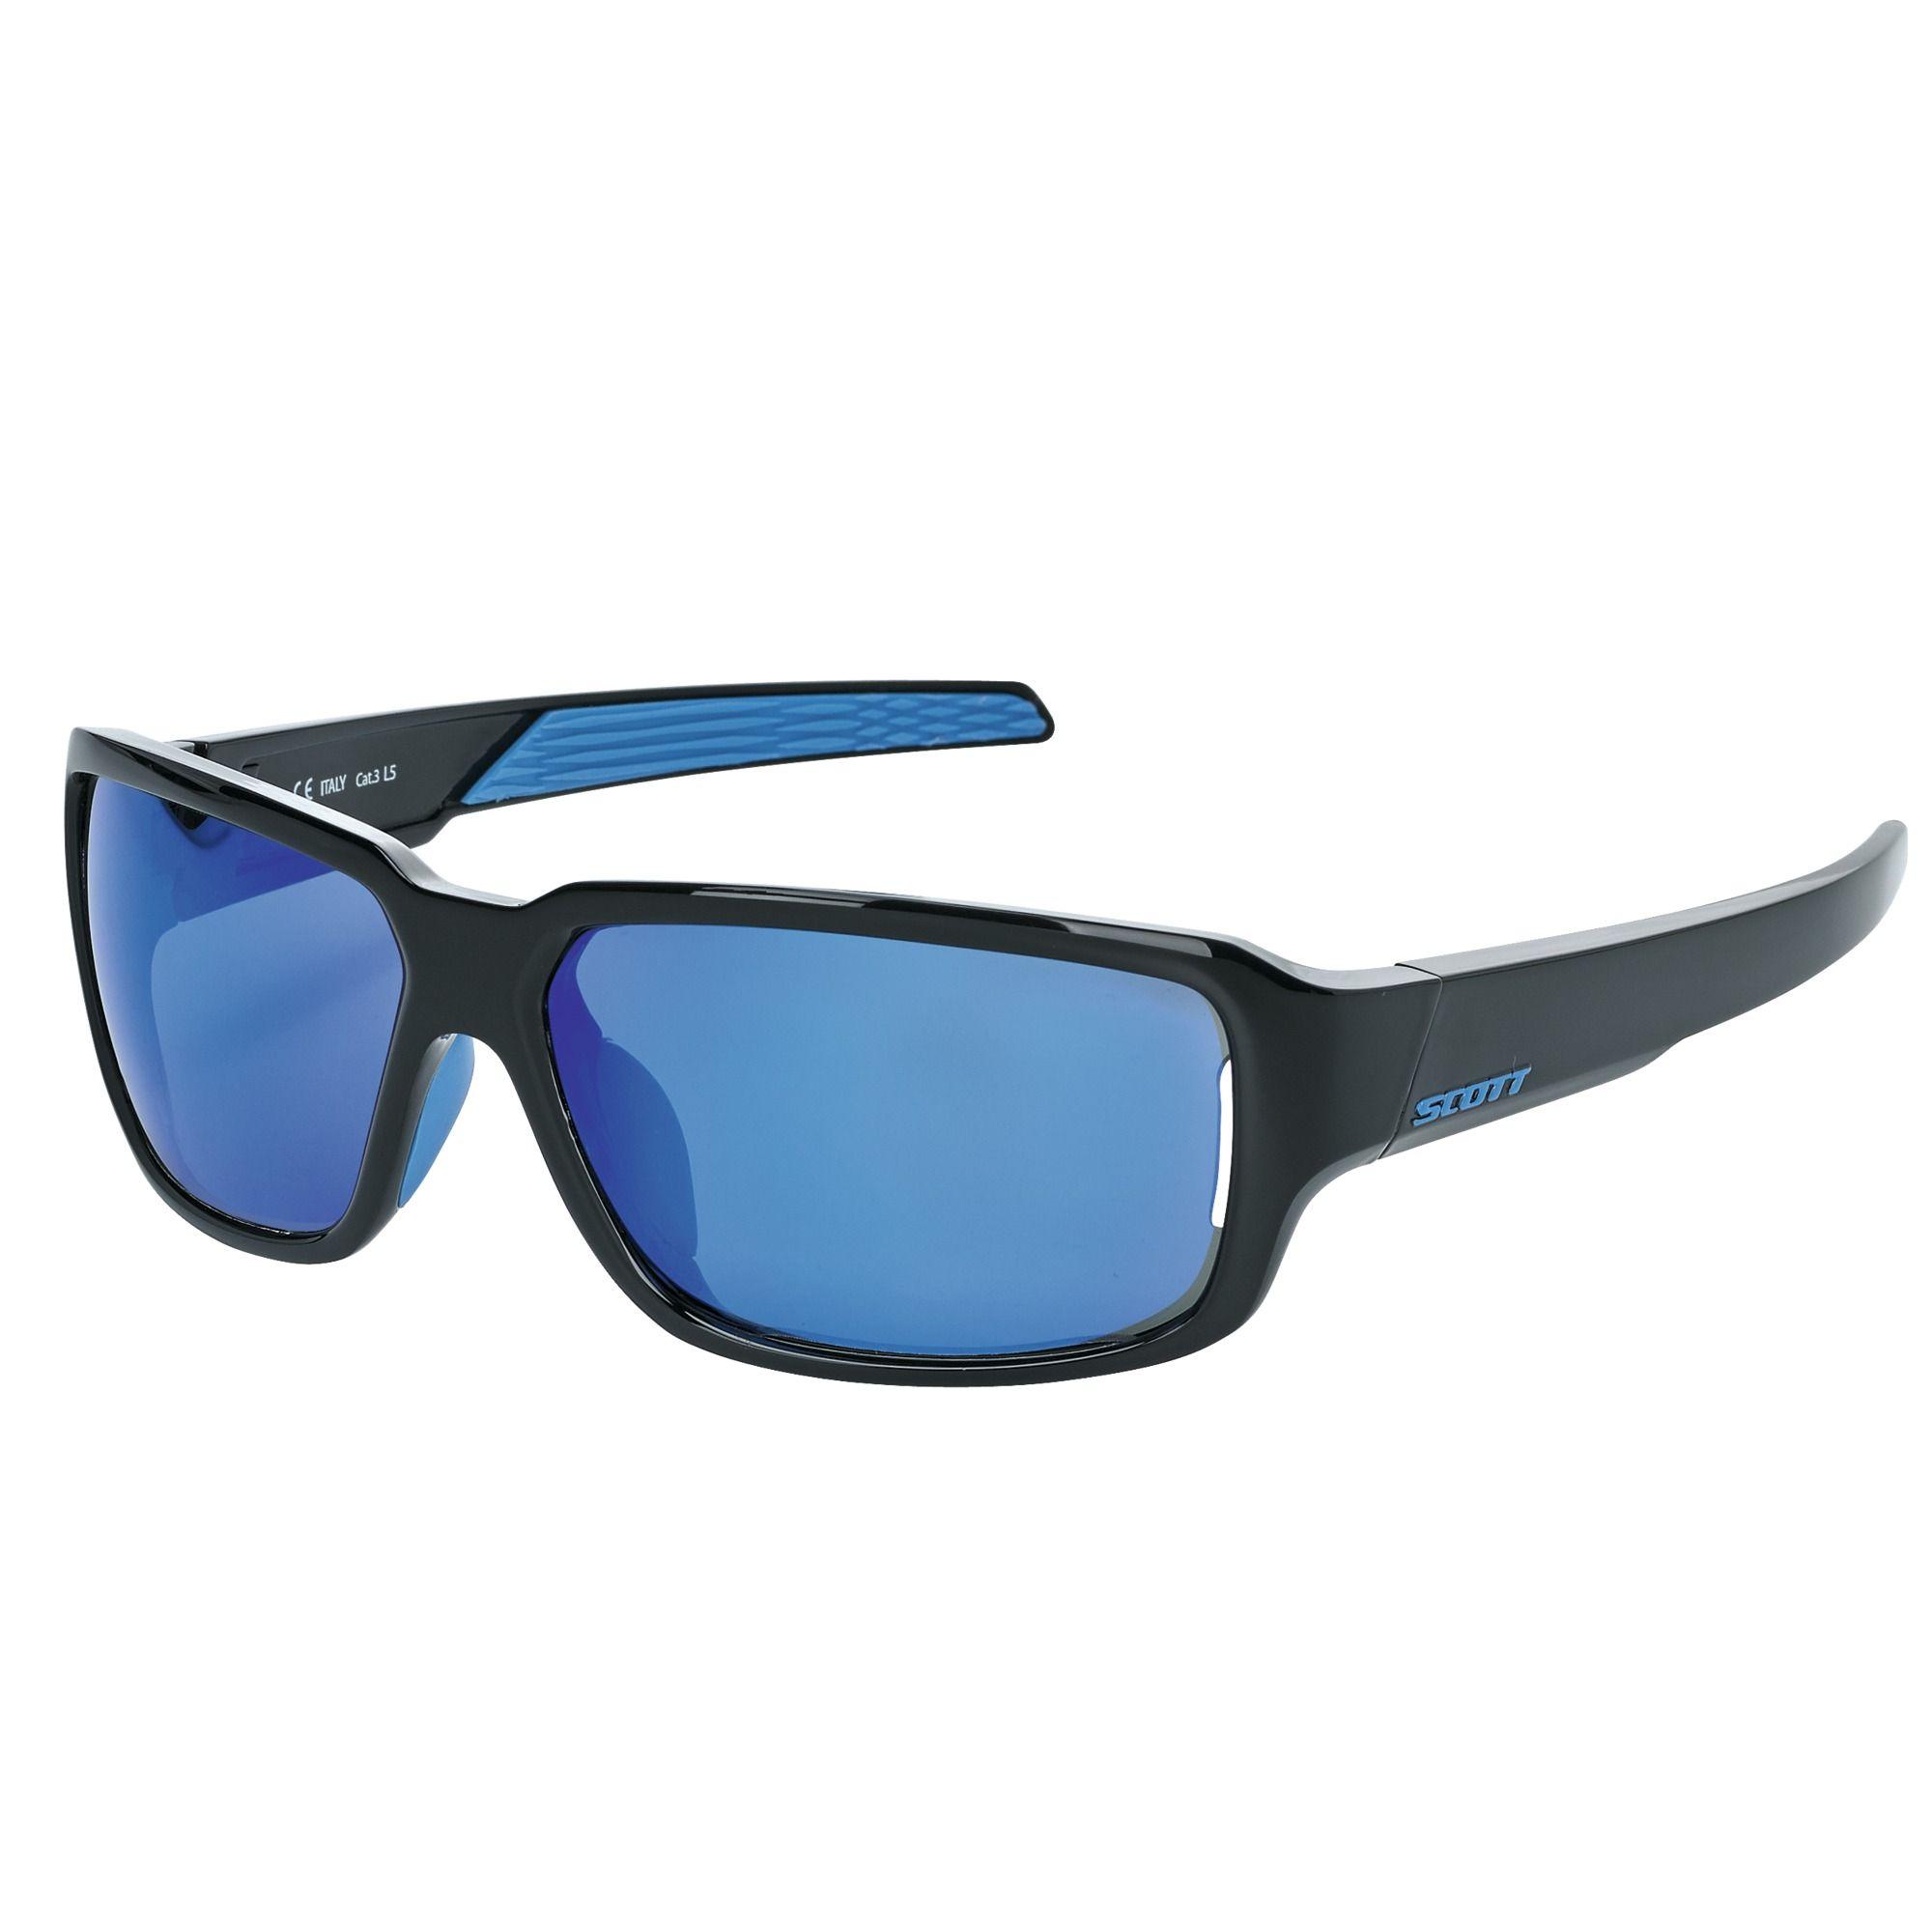 SCOTT Obsess Acs Sunglasses SCOTT Sports (With images